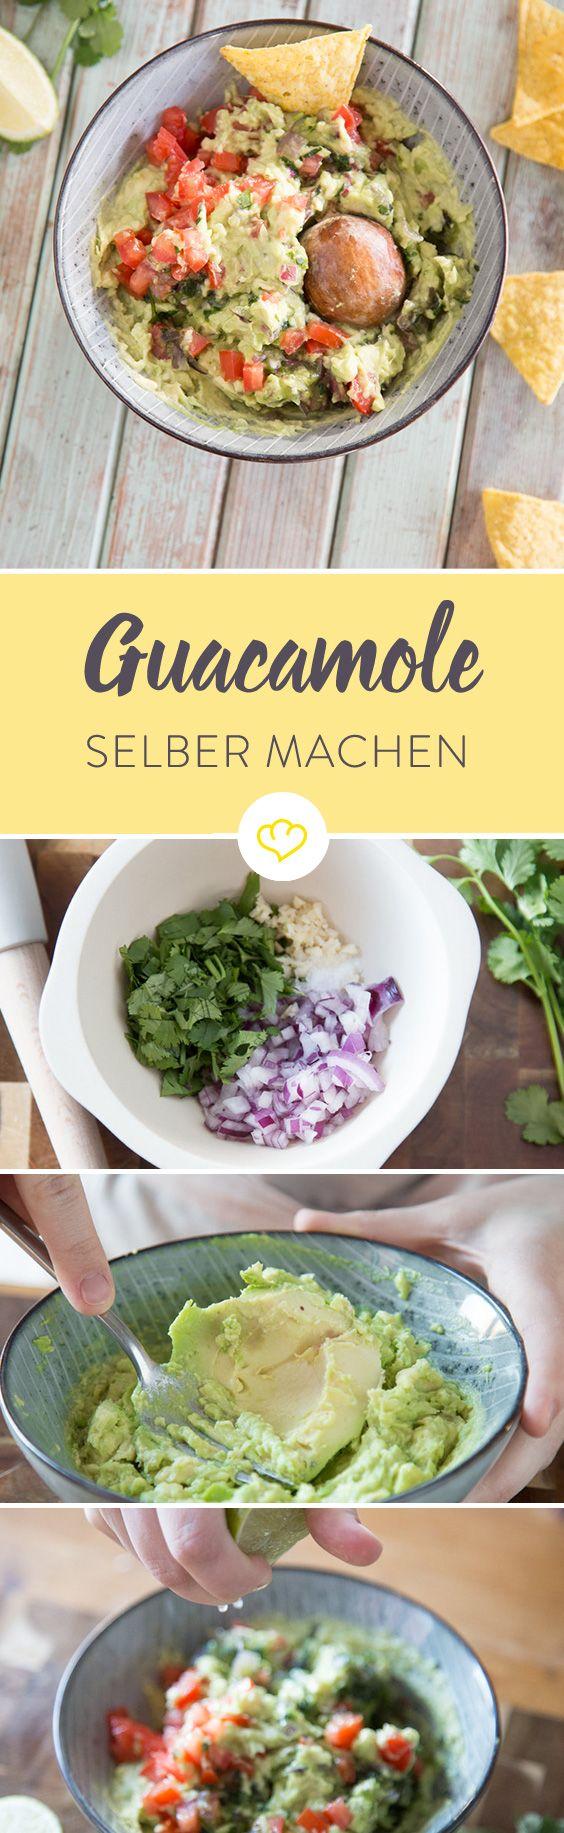 Guacamole - ganz klassisch